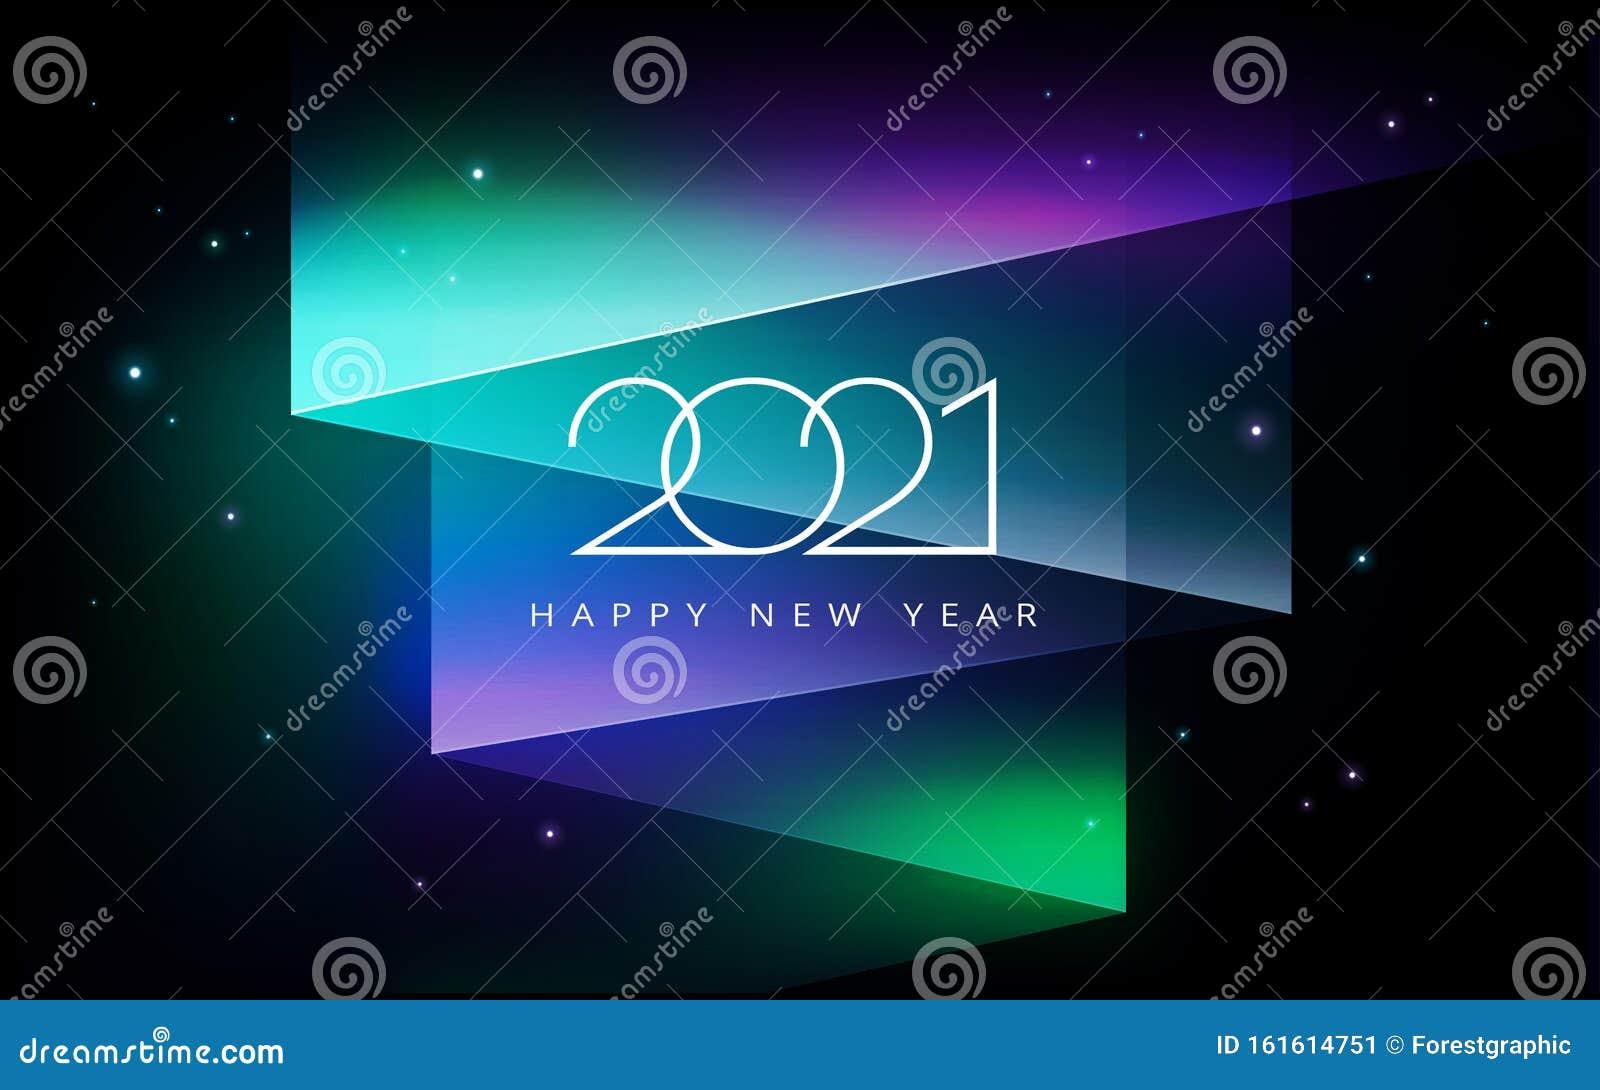 2021 Happy New Year Vector Illustration - Aurora Borealis ...